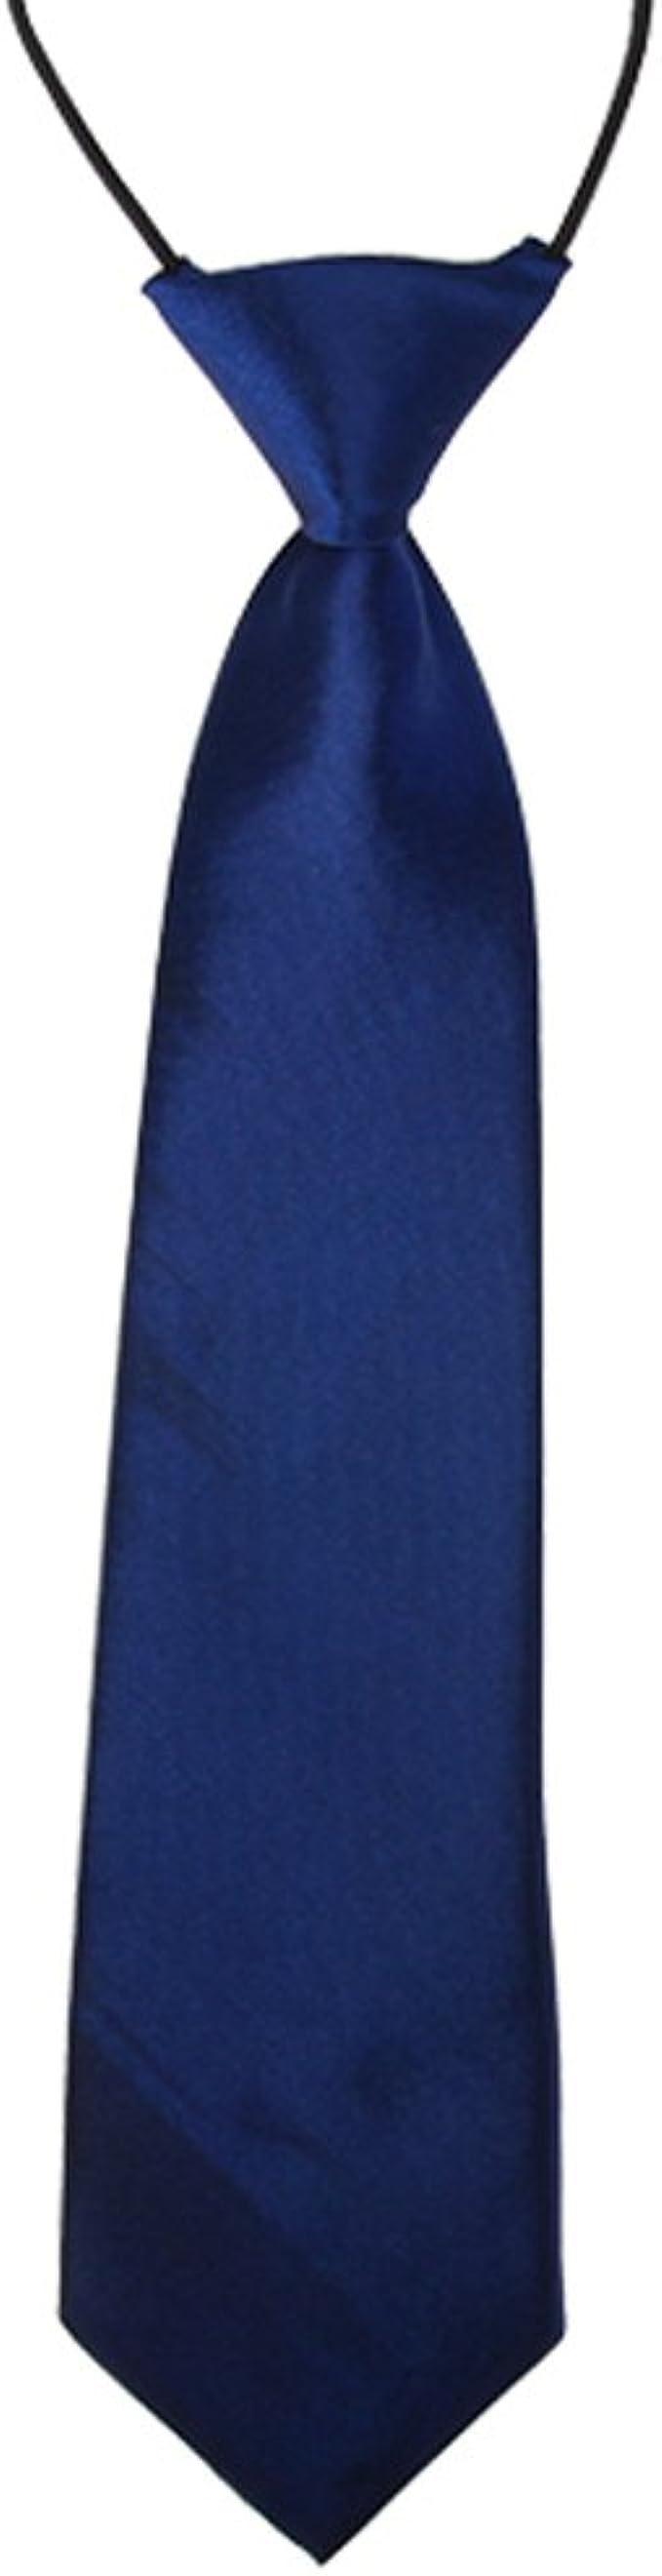 CellDeal-Satin Child Kids School Boy Wedding Elastic Neck Tie Purple